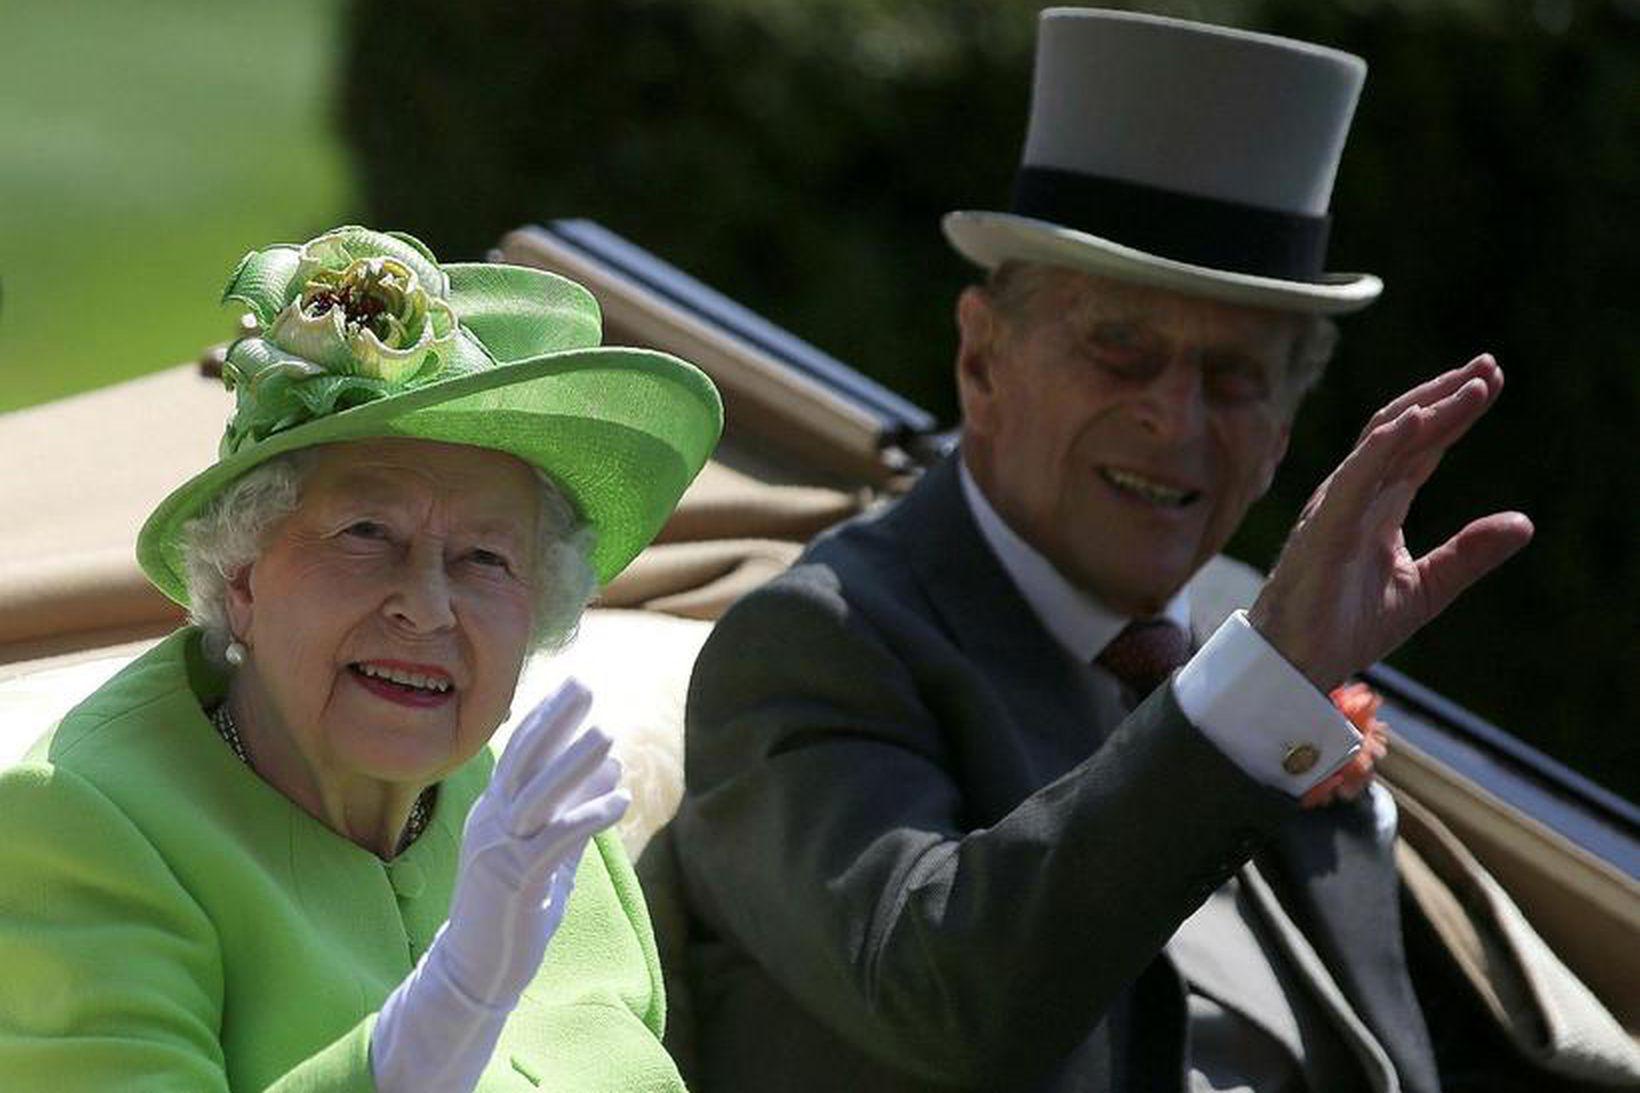 Elísabet drottning og Filippus prins halda til Skotlands í byrjun …